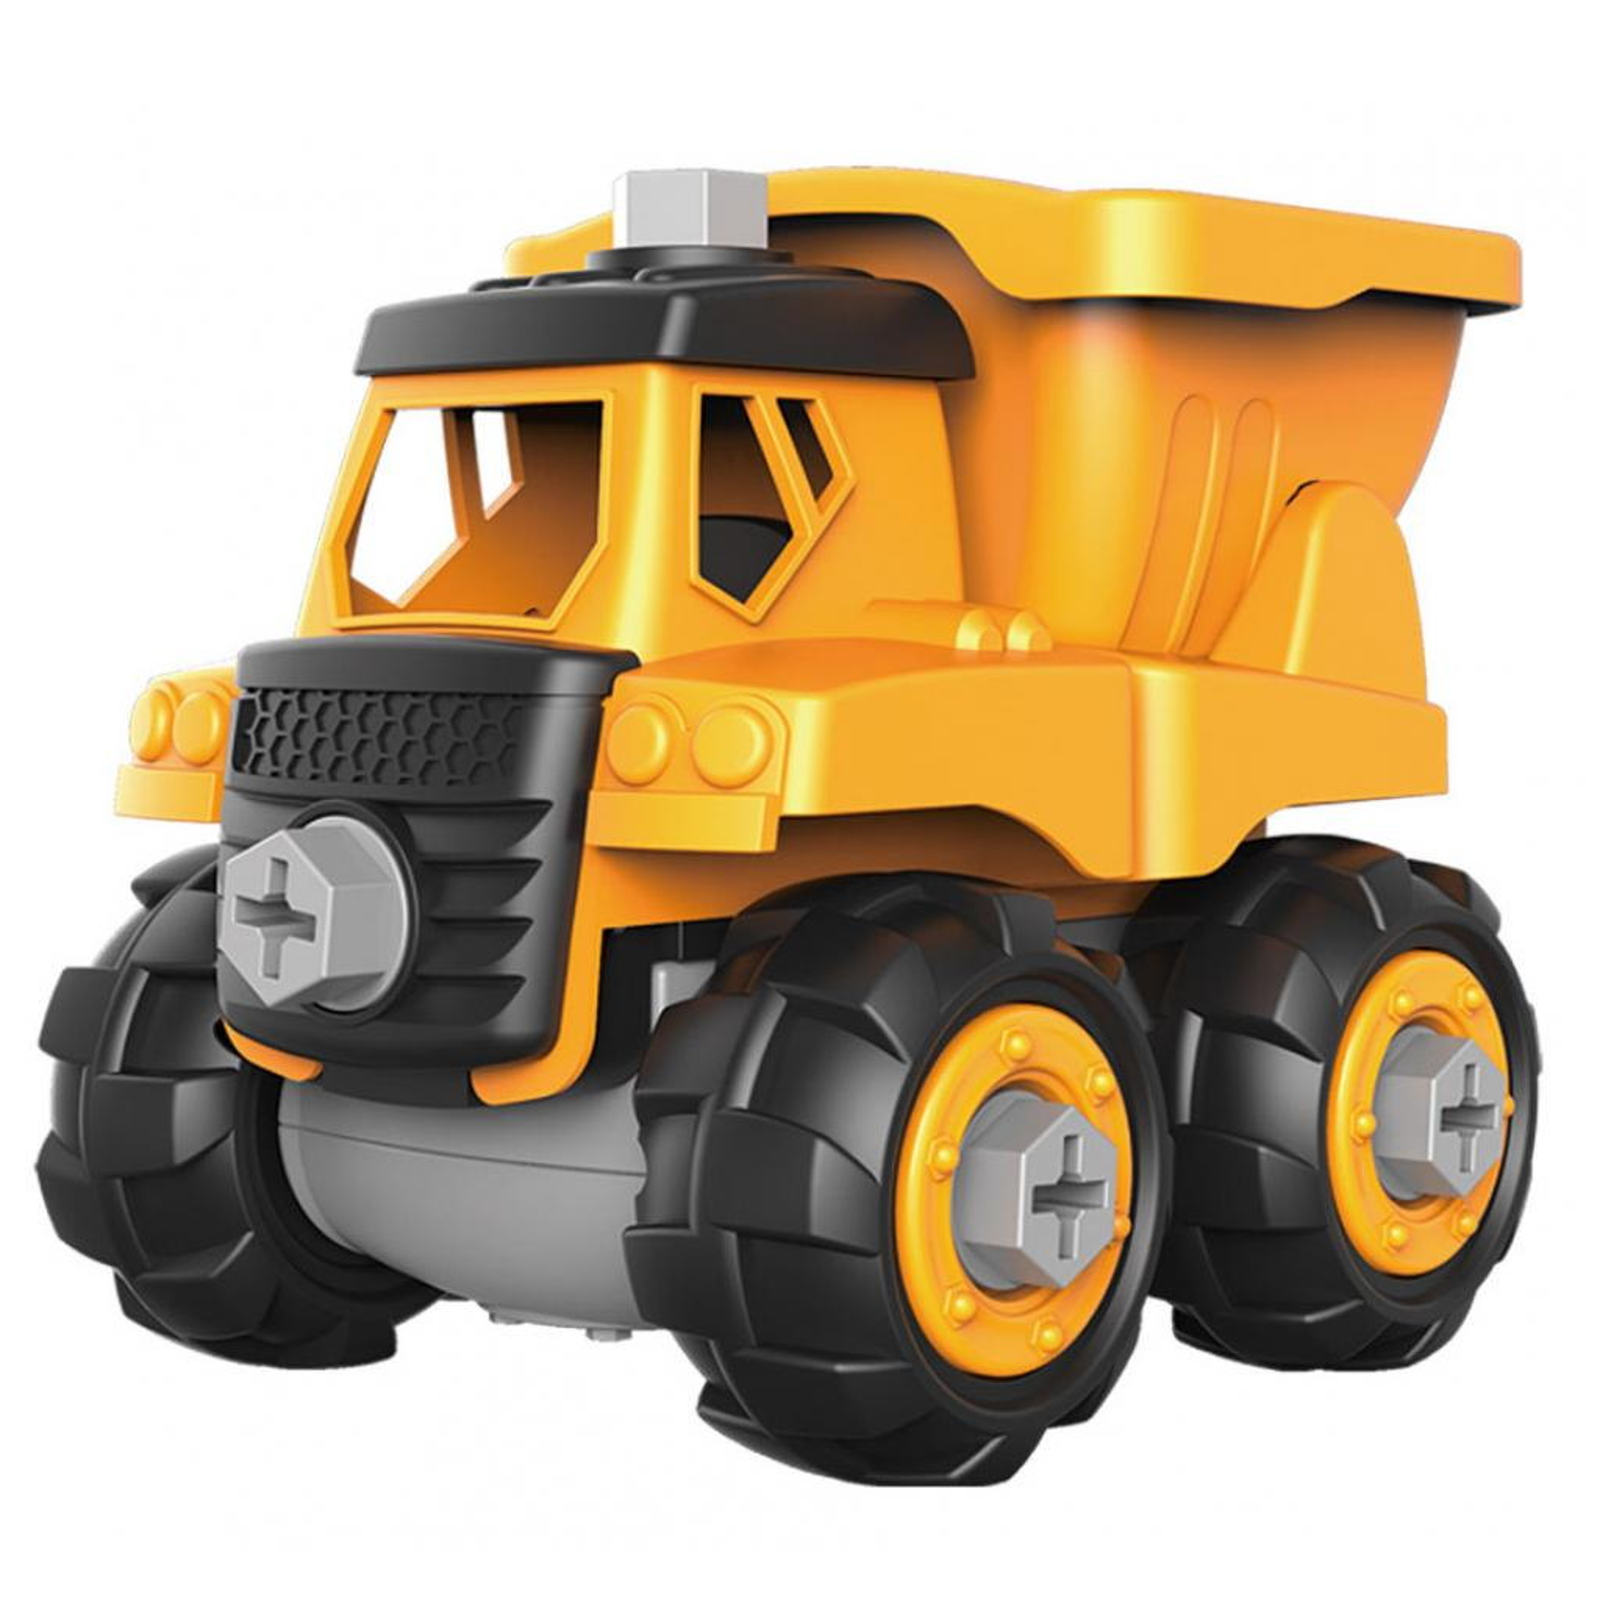 Конструктор Microlab Toys Строительная техника - грузовик (MT8906)